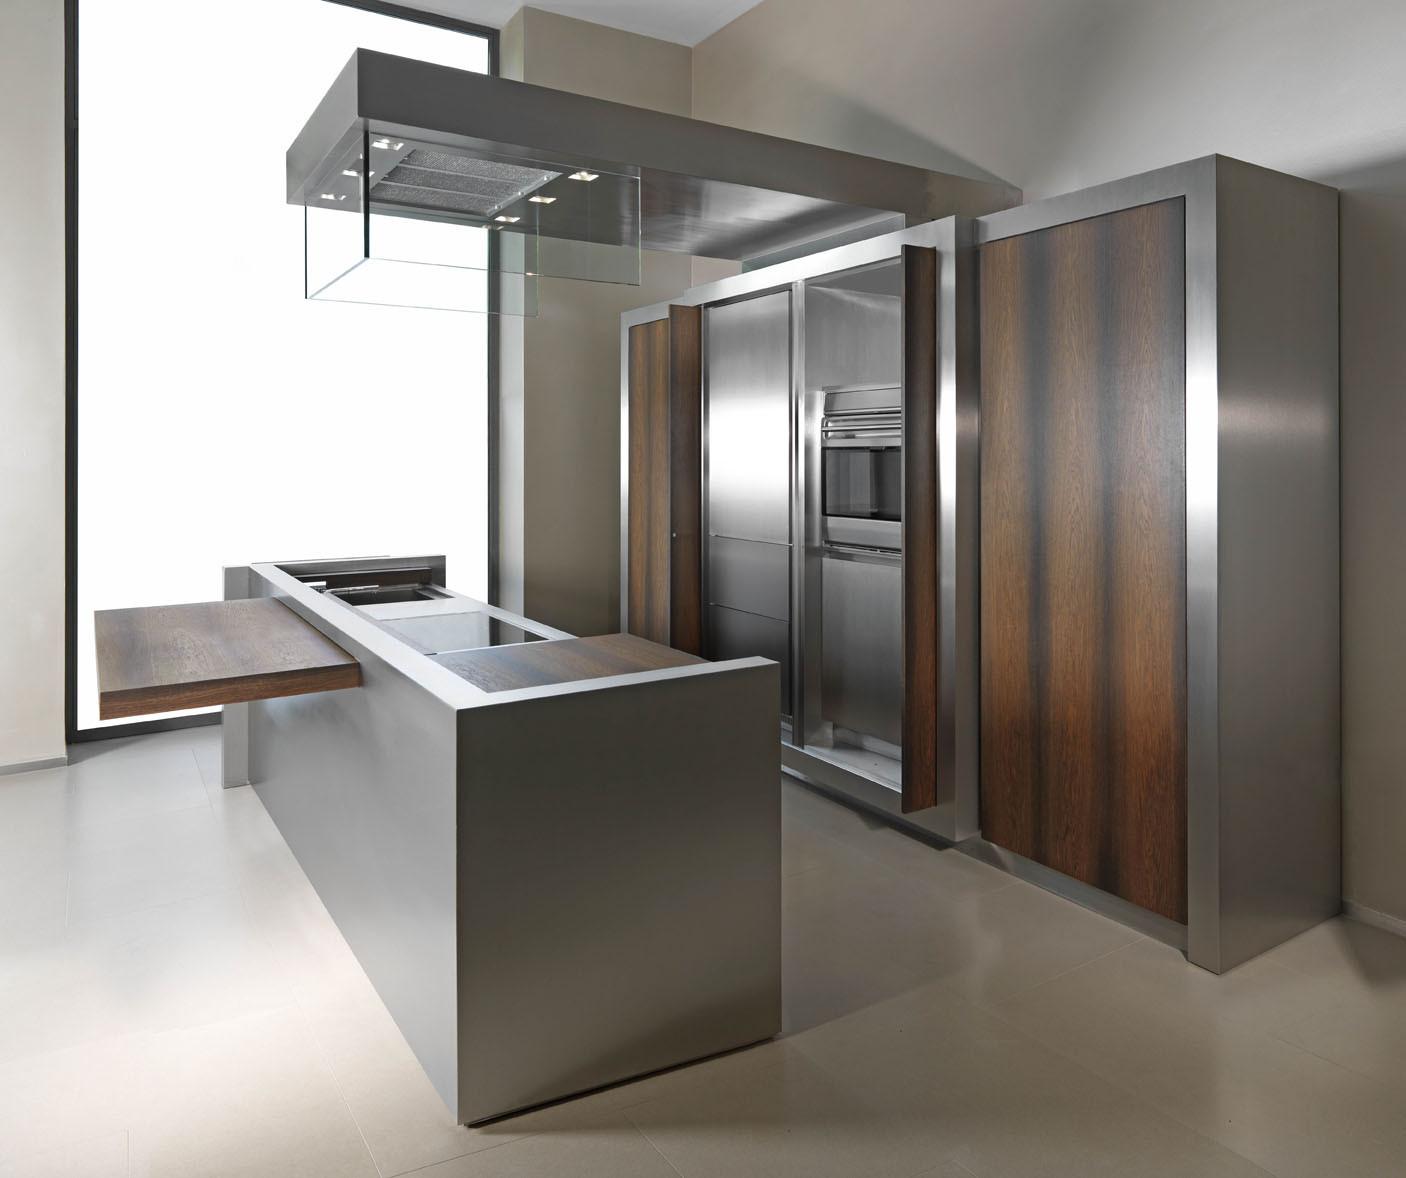 Best ideas about Stainless Steel Kitchen Decor . Save or Pin 7 Stainless Steel Kitchen Cabinets with Modern Look Now.